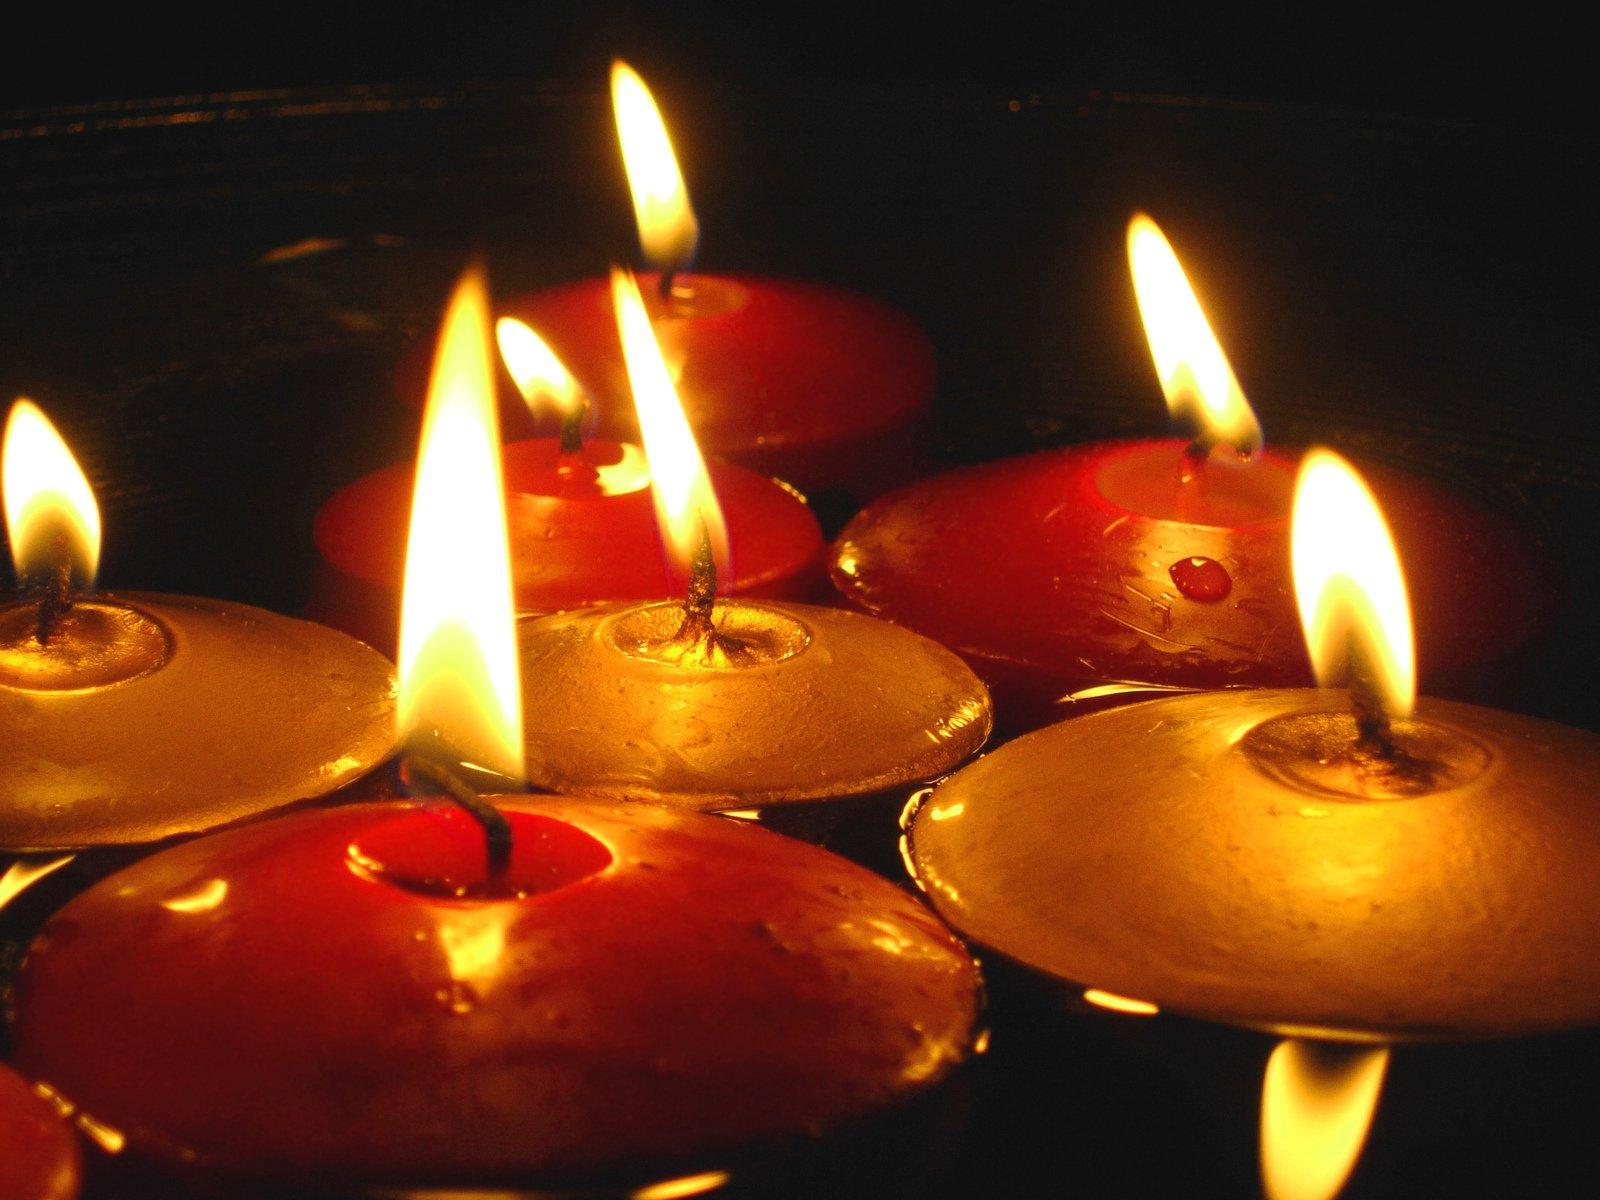 Free candele galleggianti stock photo freeimages